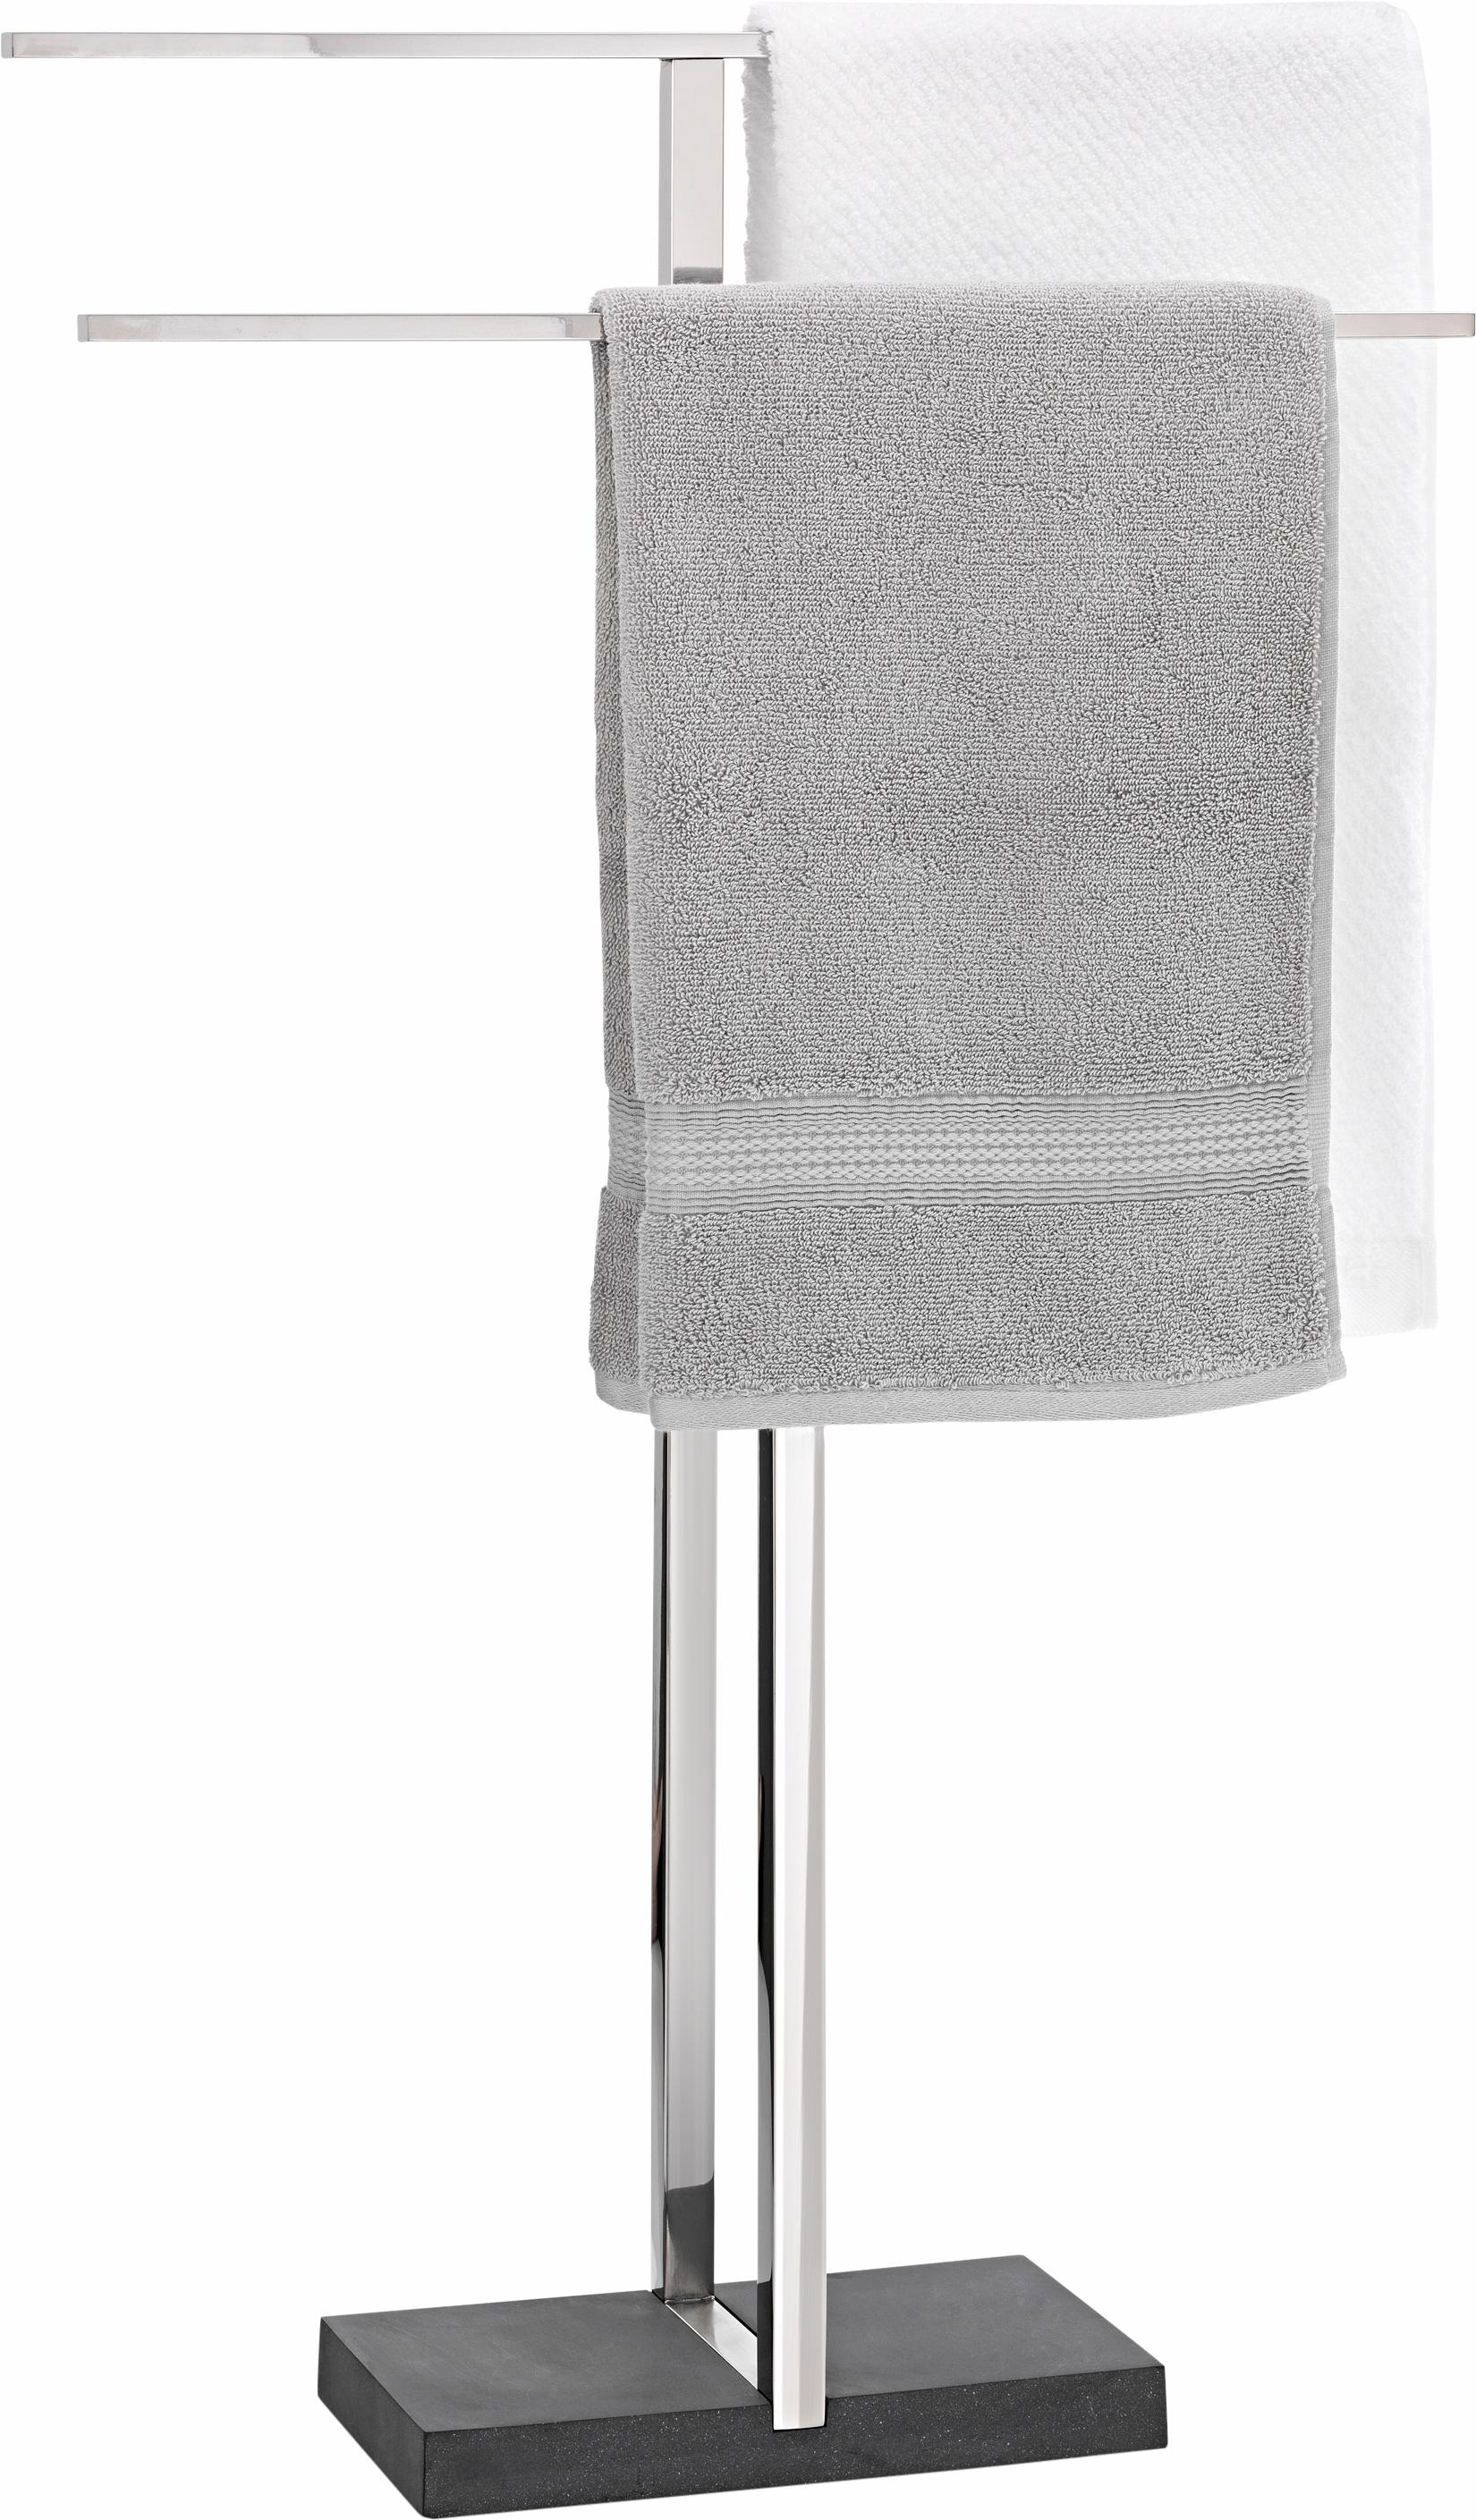 Handtuchhalter Blomus Areo Handtuchhalter L 46 cm